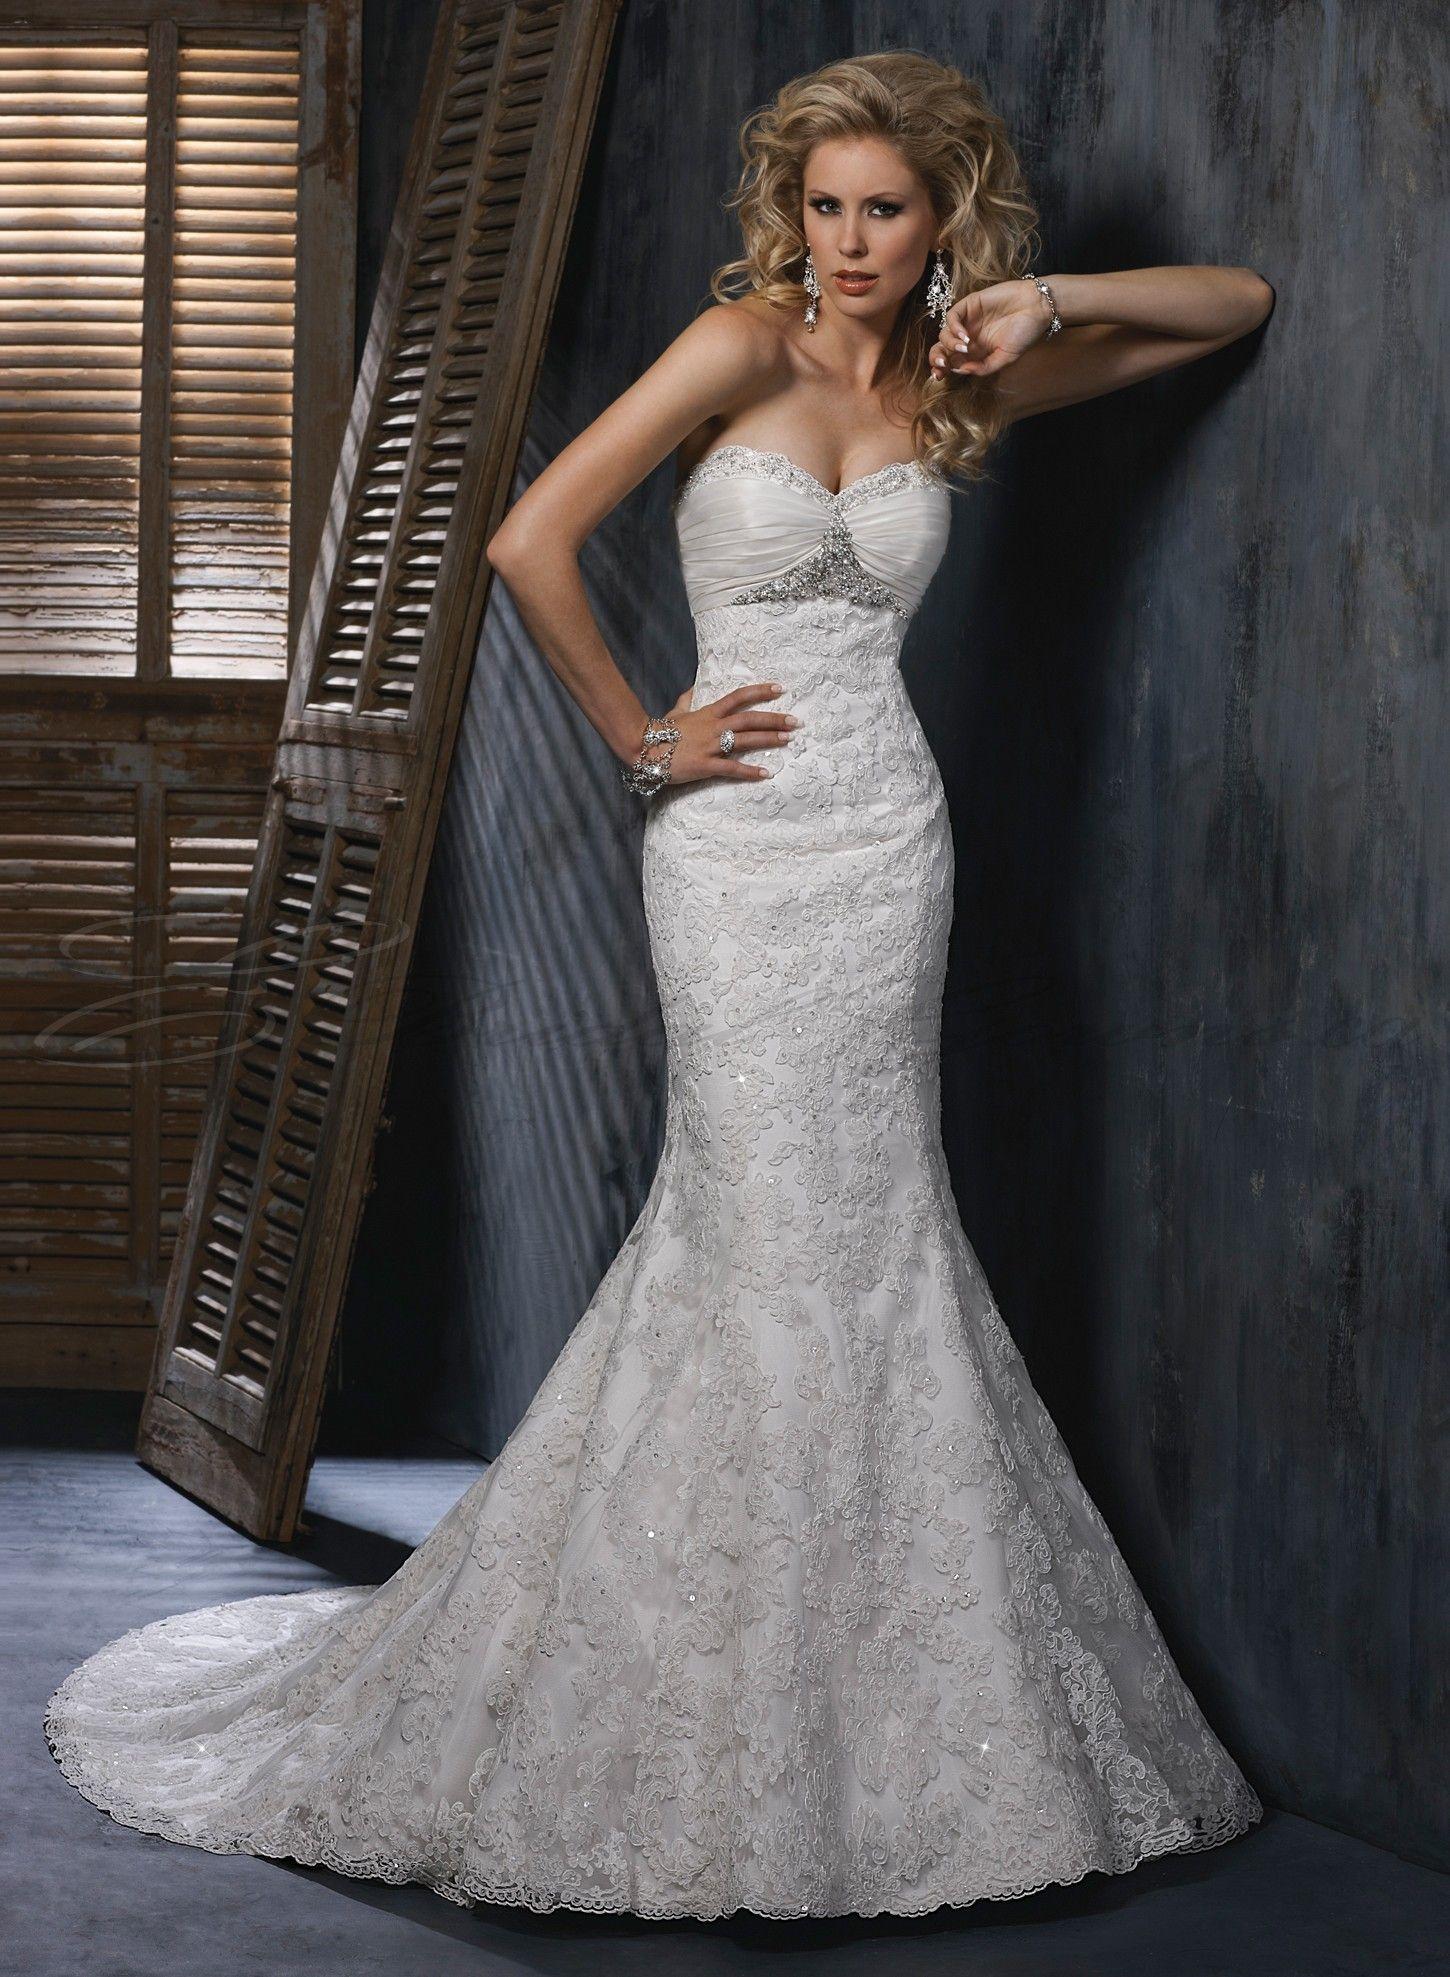 Mermaid Wedding Dresses: Fresh and Inspiring Gown   wedding ...